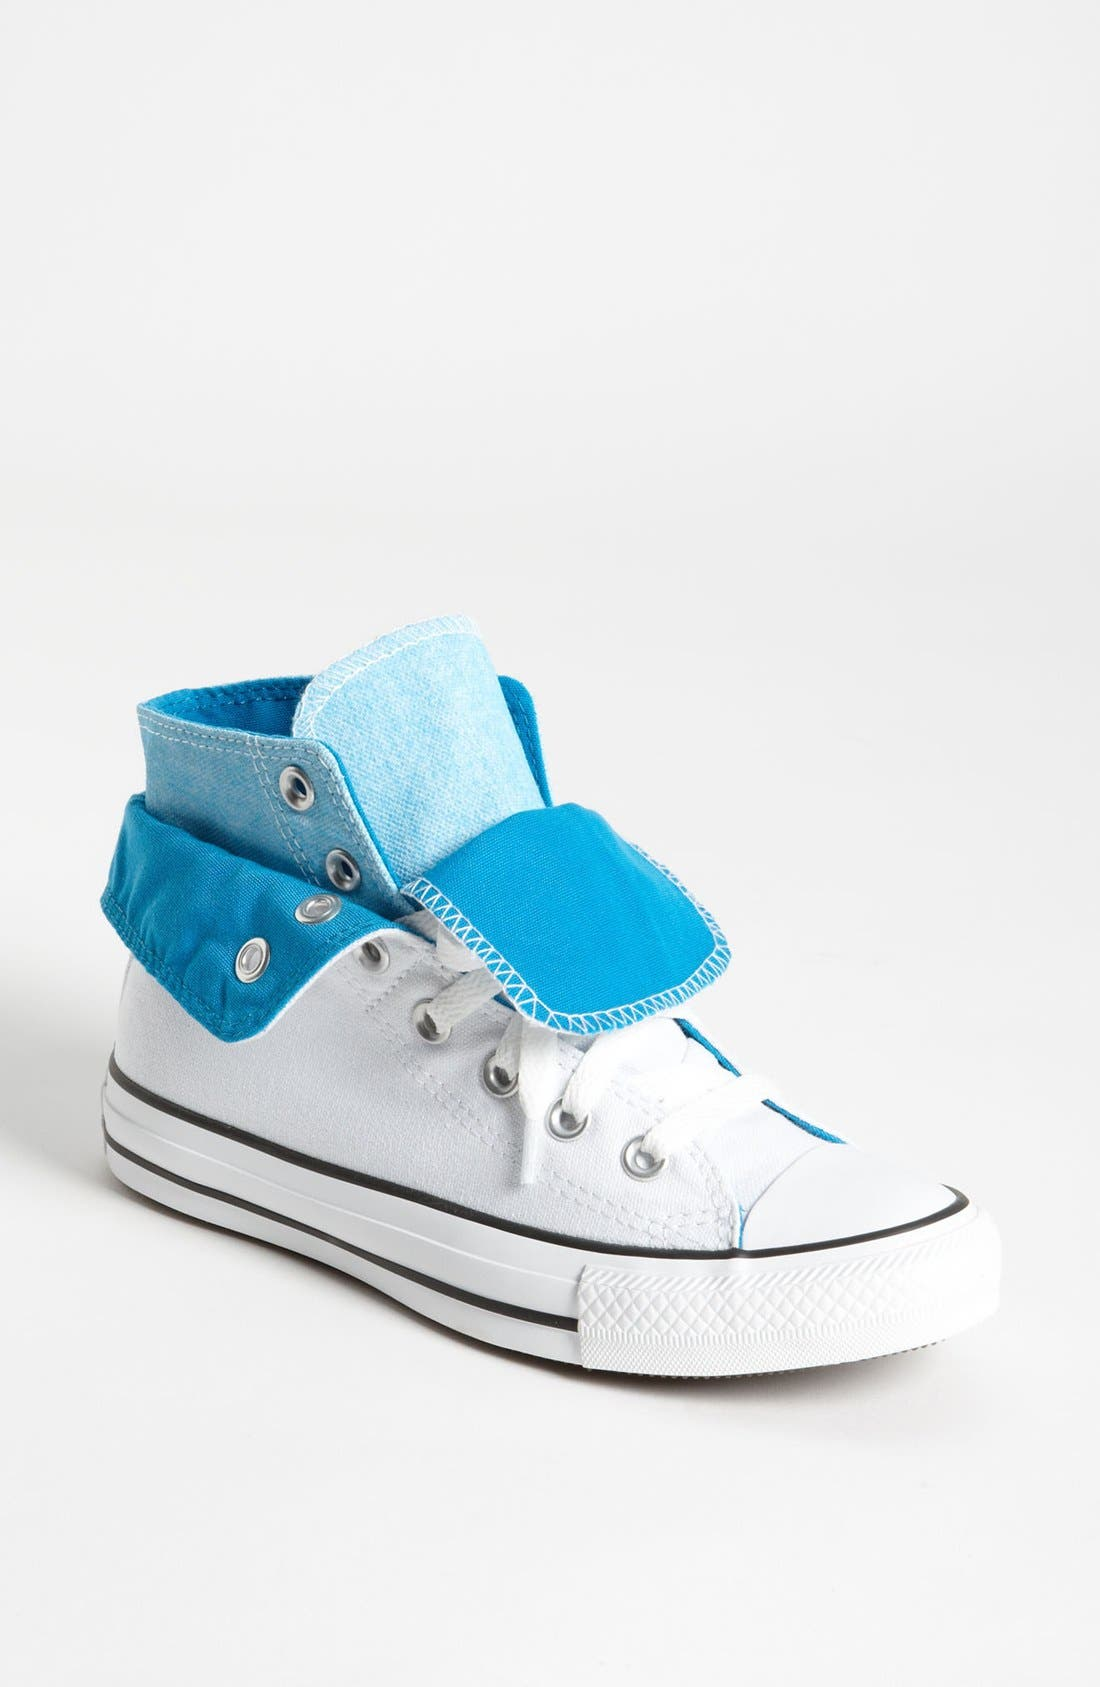 Main Image - Converse Chuck Taylor® All Star® Double Tongue High Top Sneaker (Women)